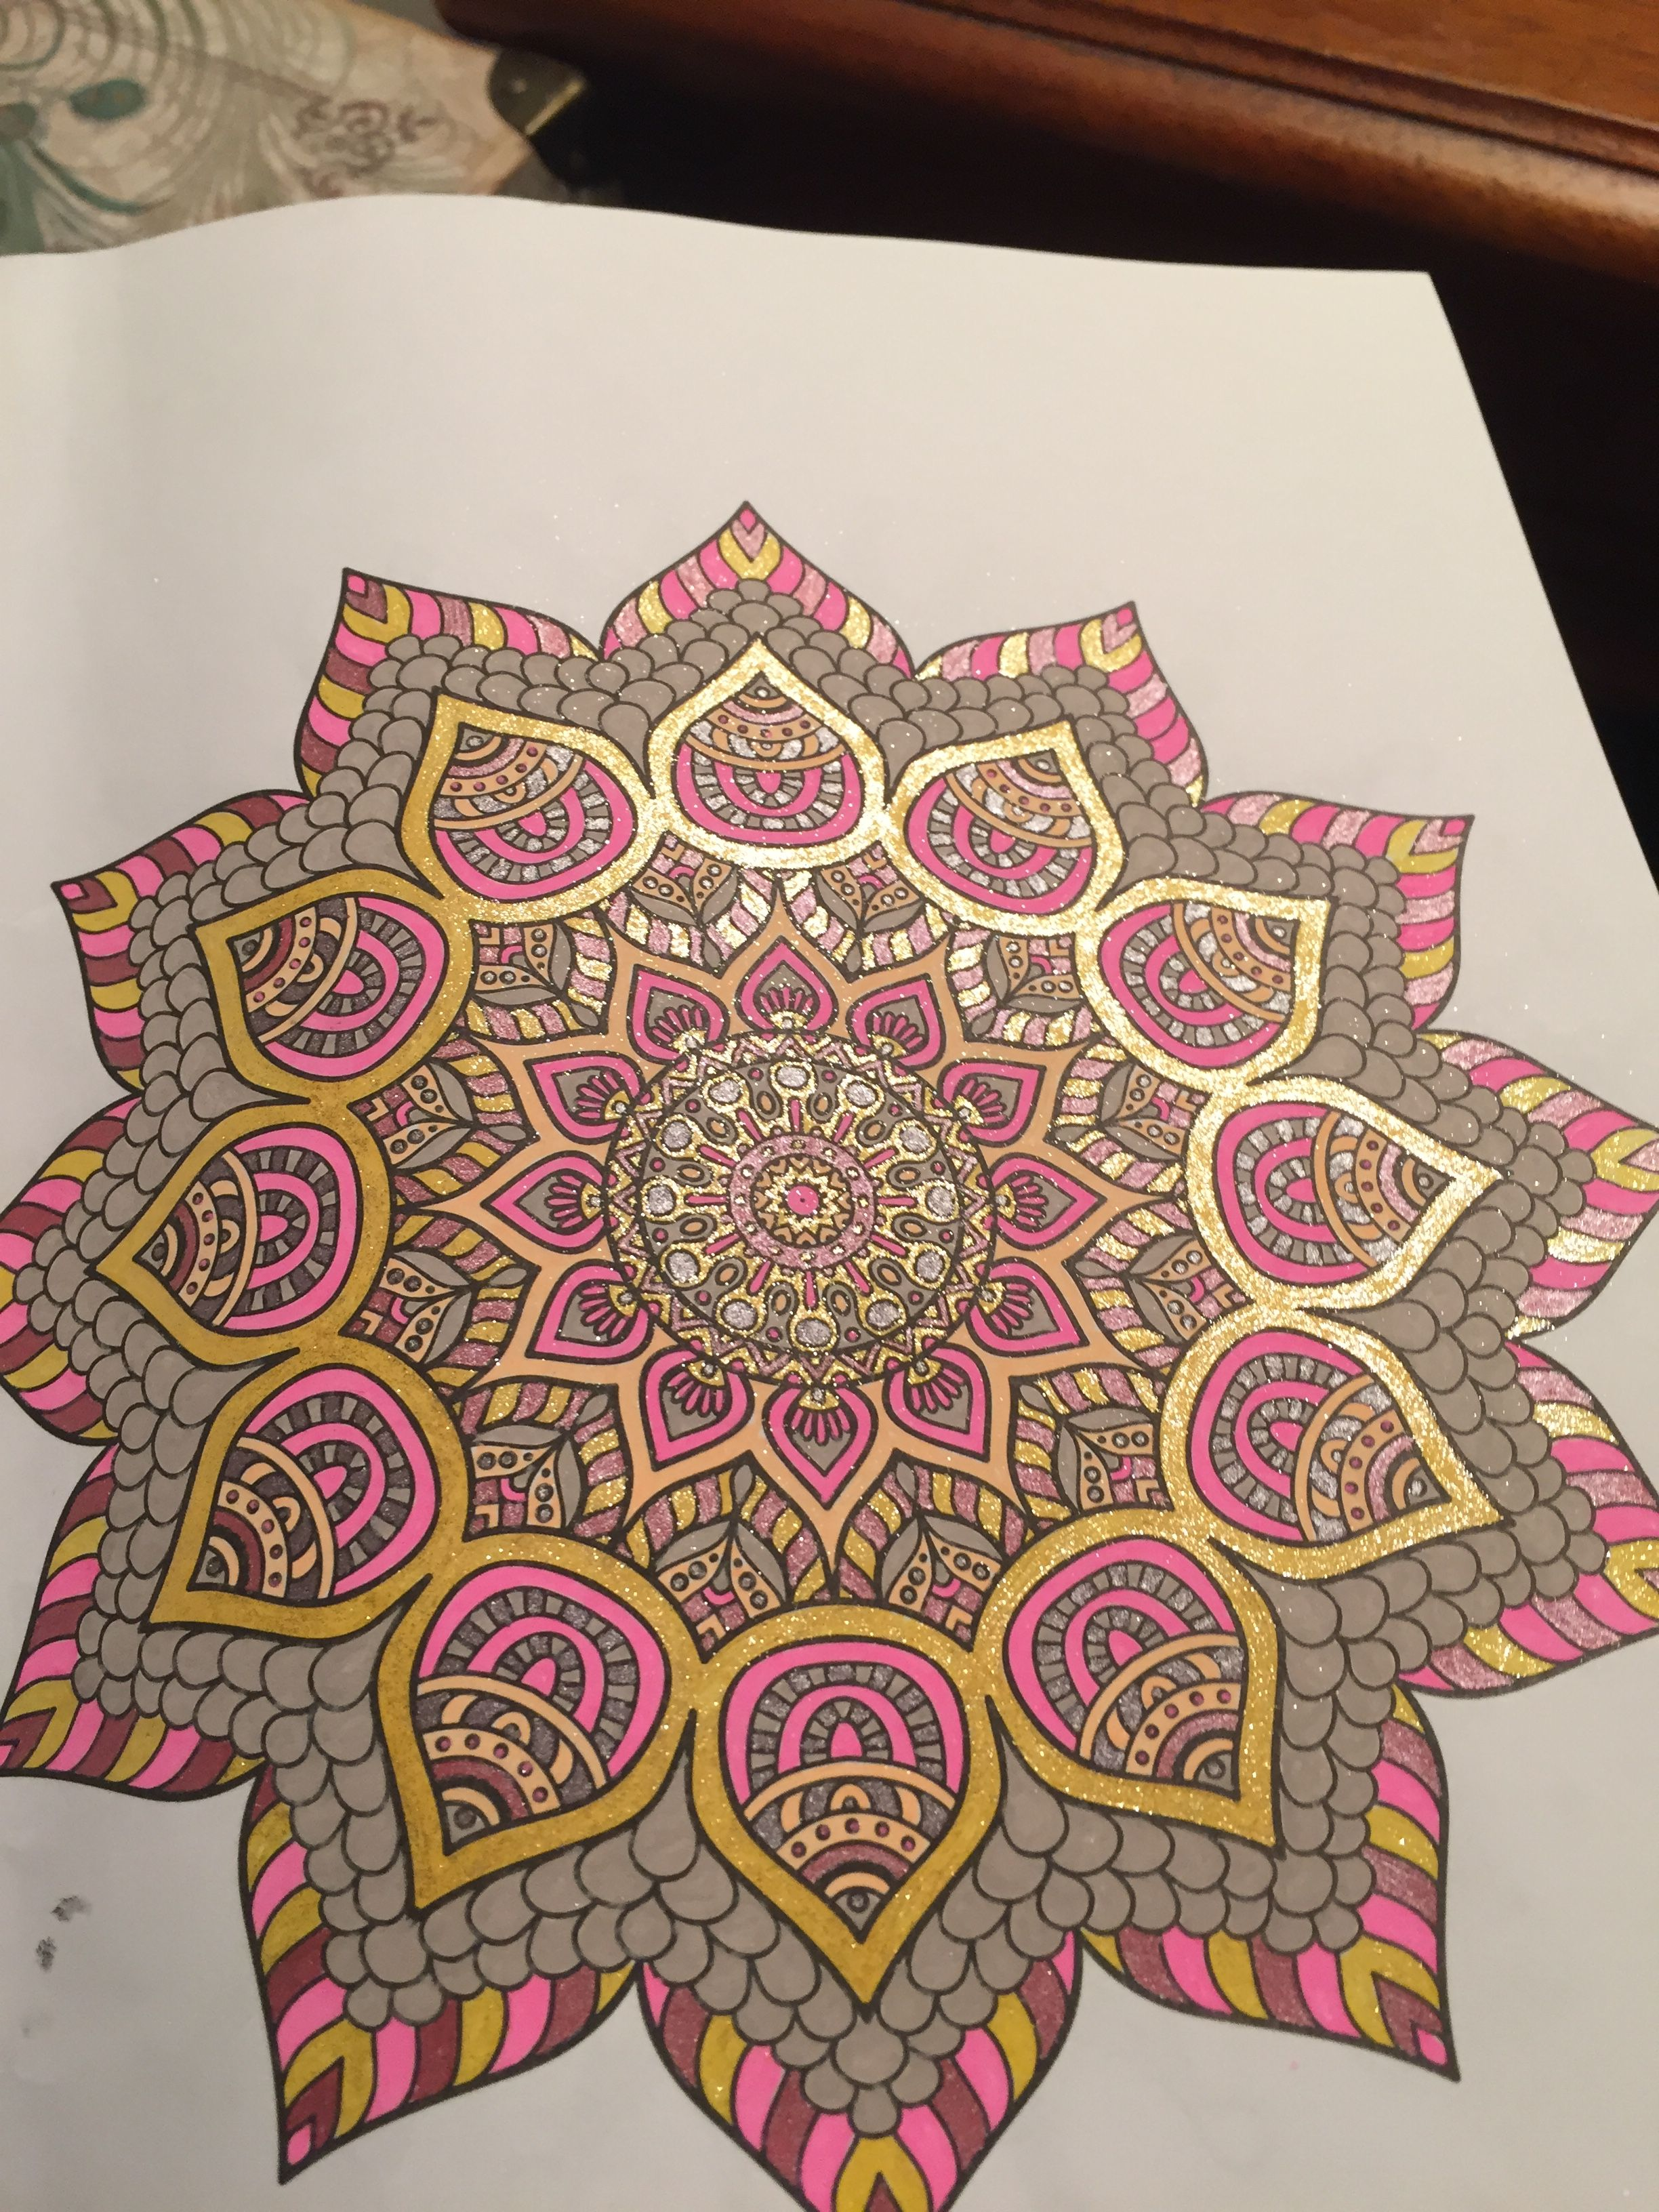 Finished Mandala By Patricia Gary Mandala Coloring Pages Coloring Pages Mandala